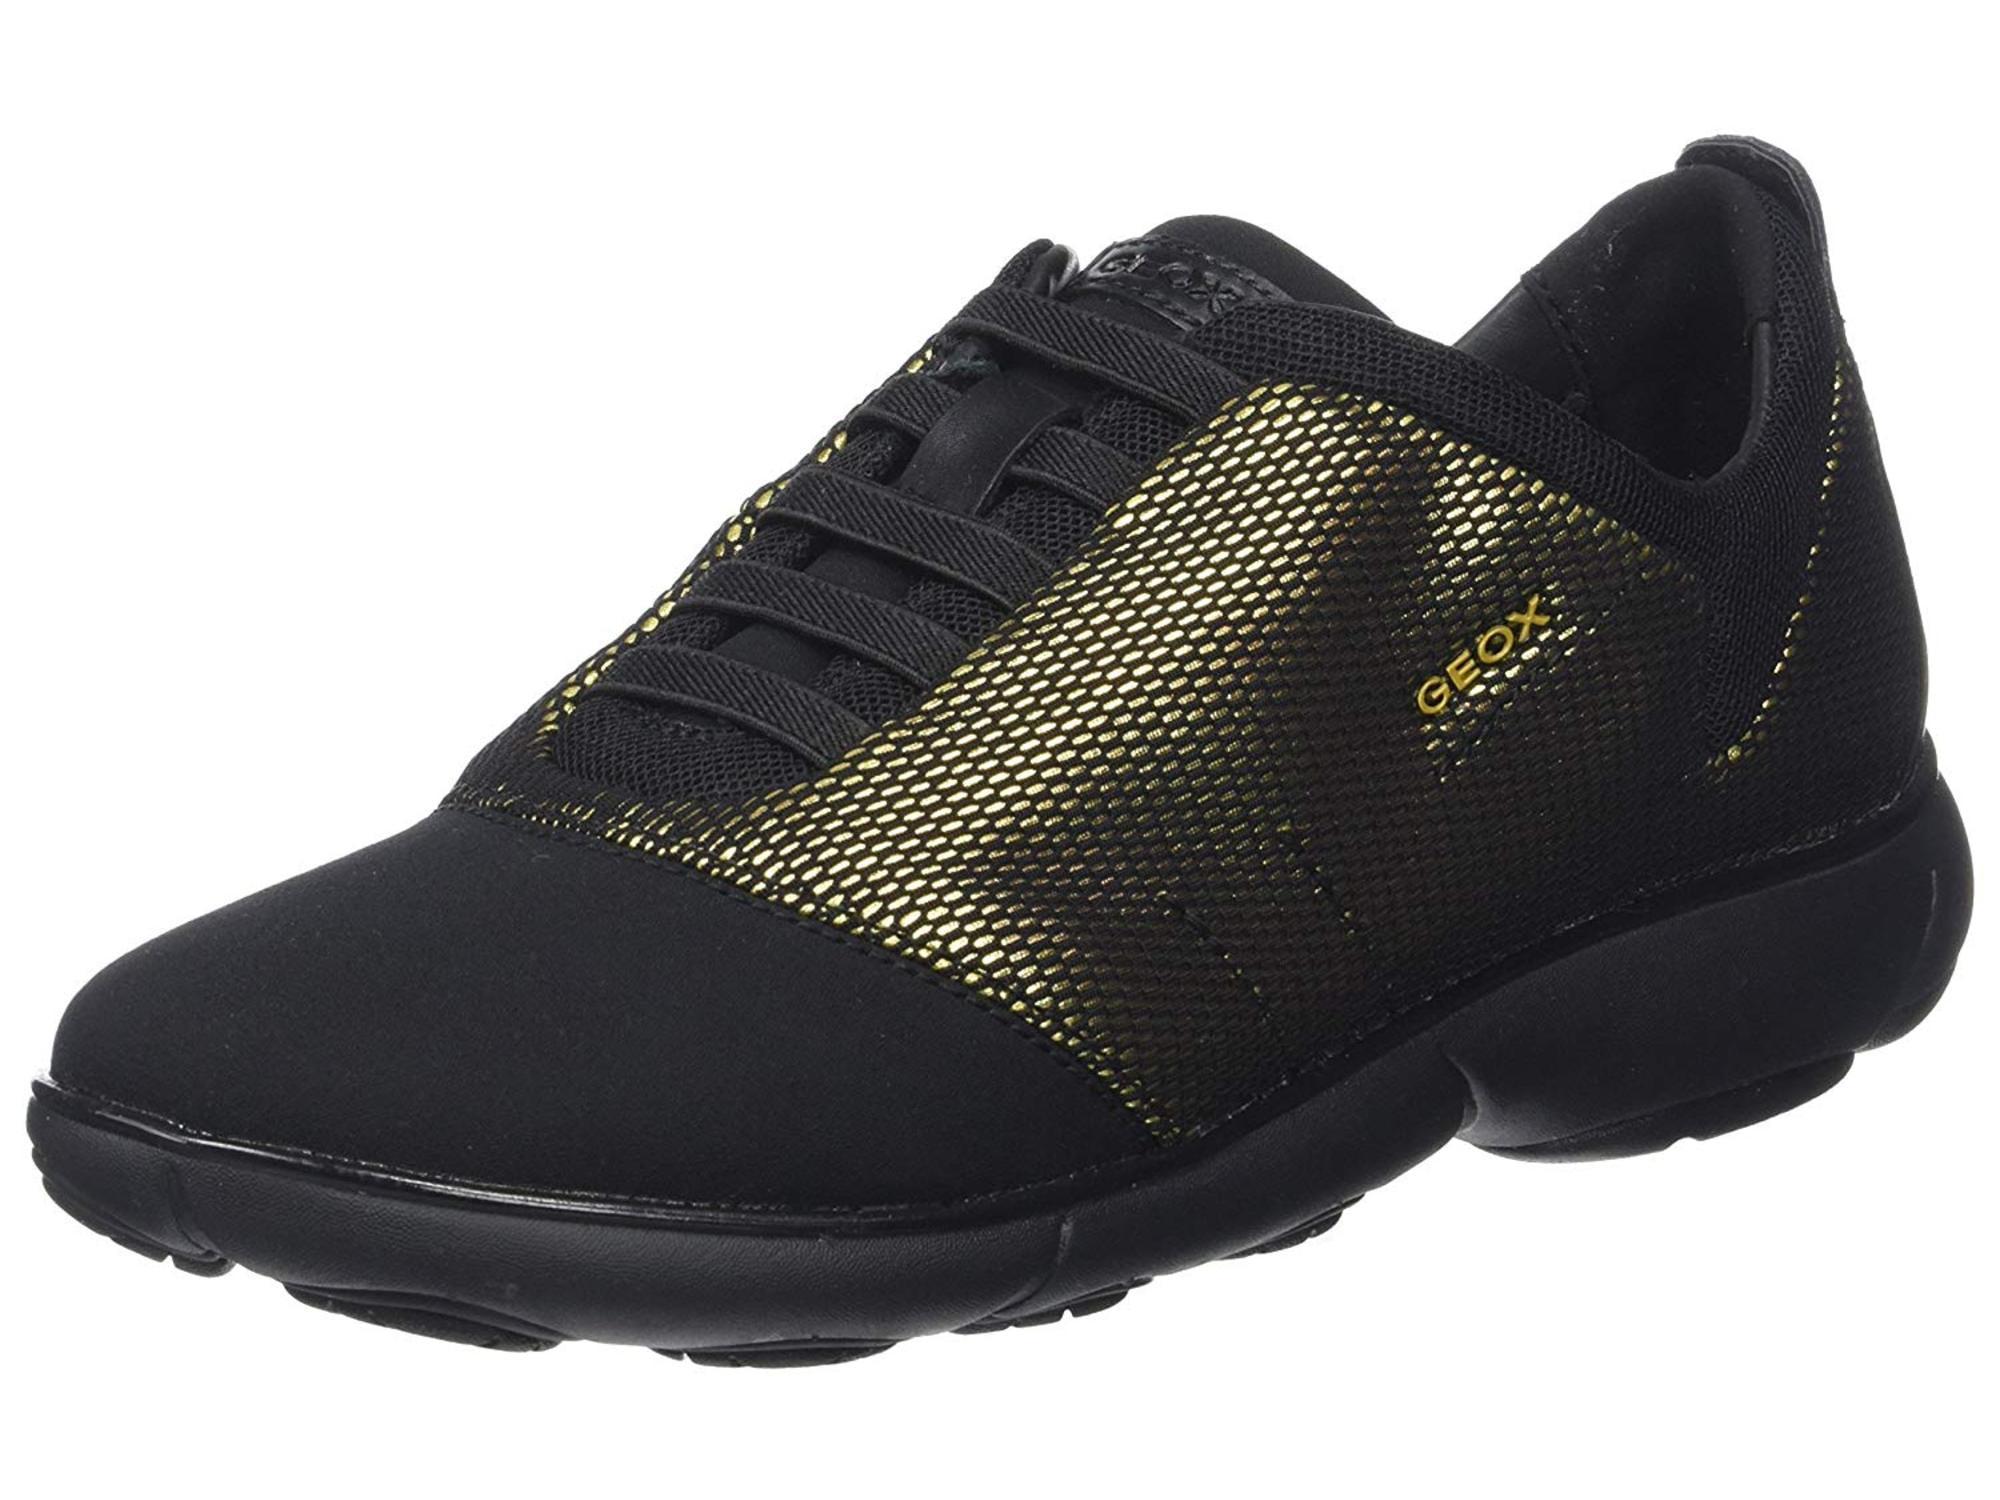 Geox Womens Nebula 16 Sneaker Low Top Bungee Fashion Sneakers by Geox